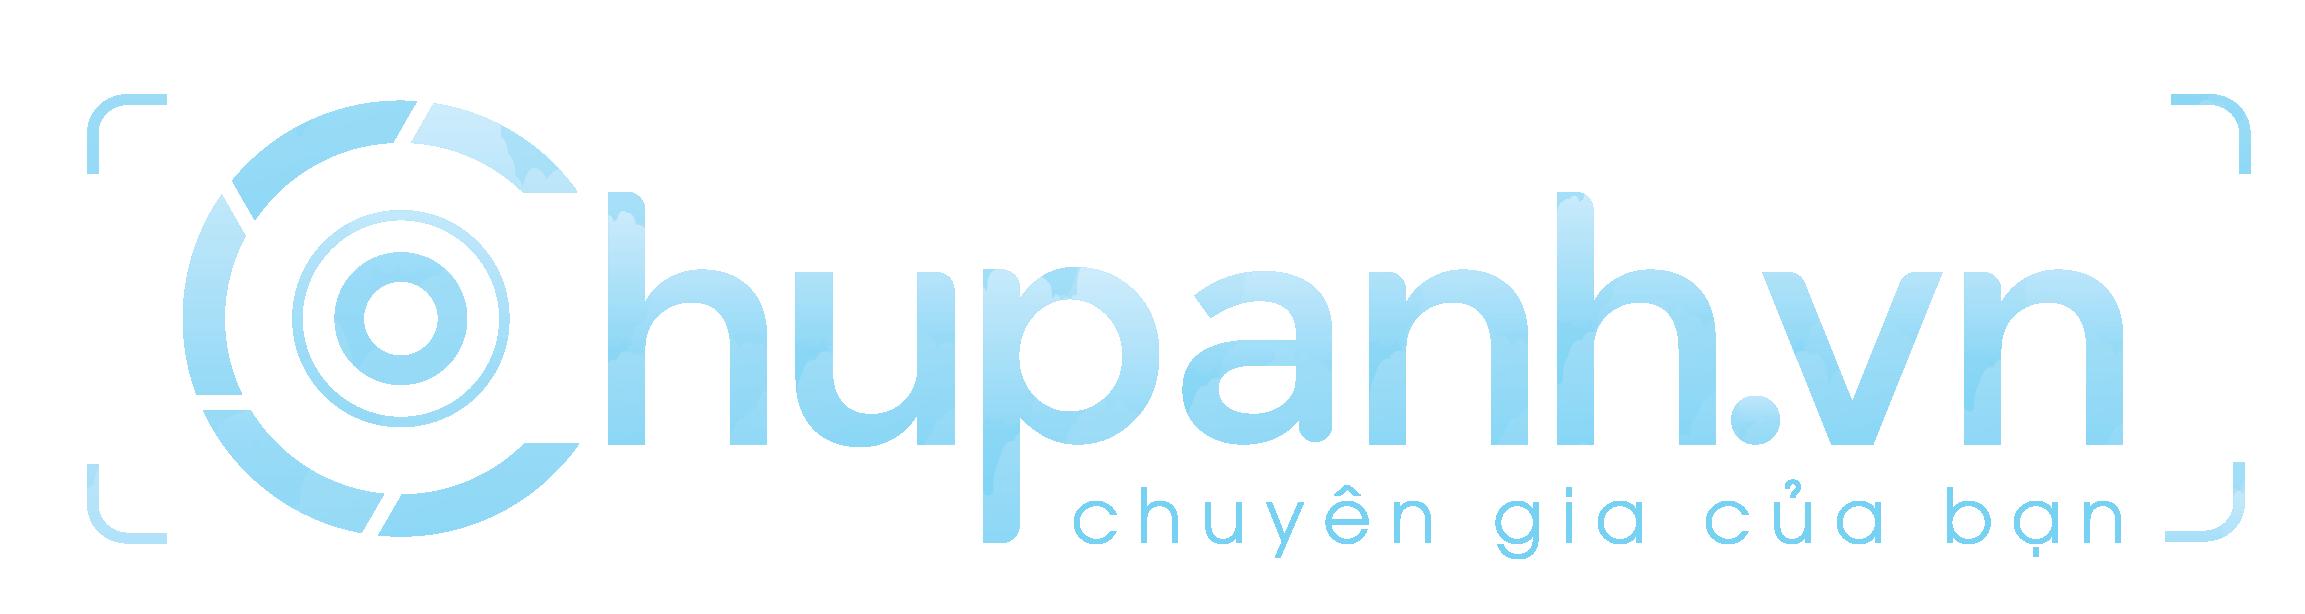 Chupanh.vn